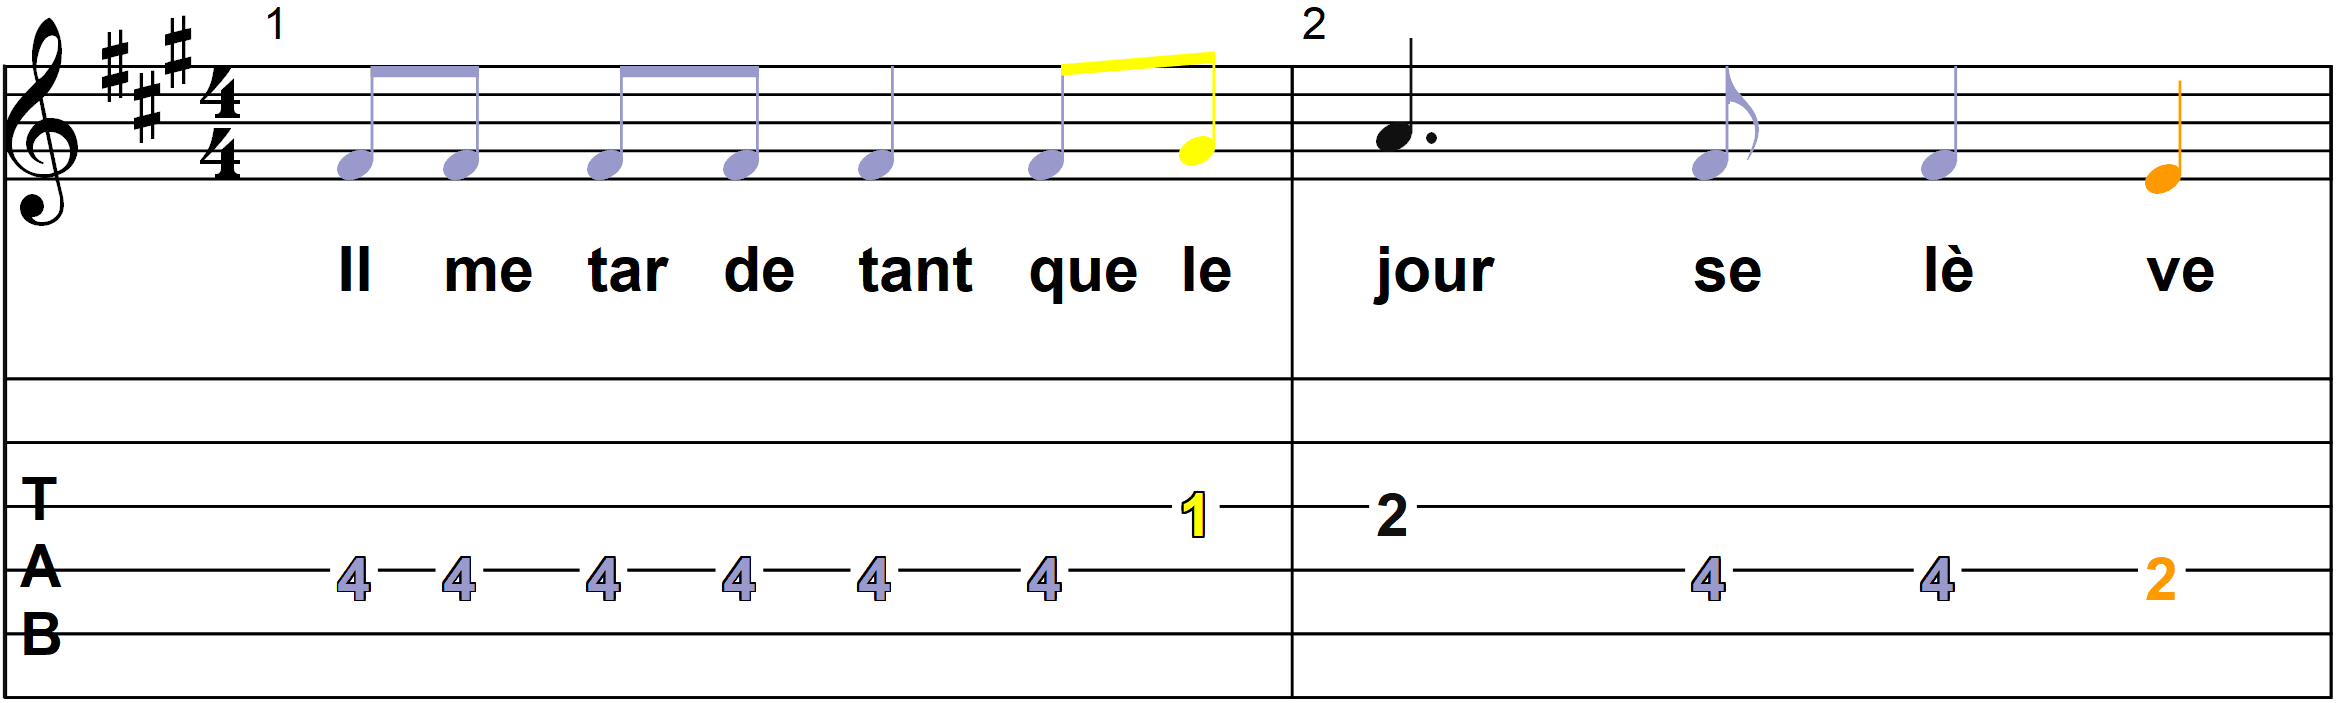 Petit Papa Noel - Mélodie du couplet B - Page 1